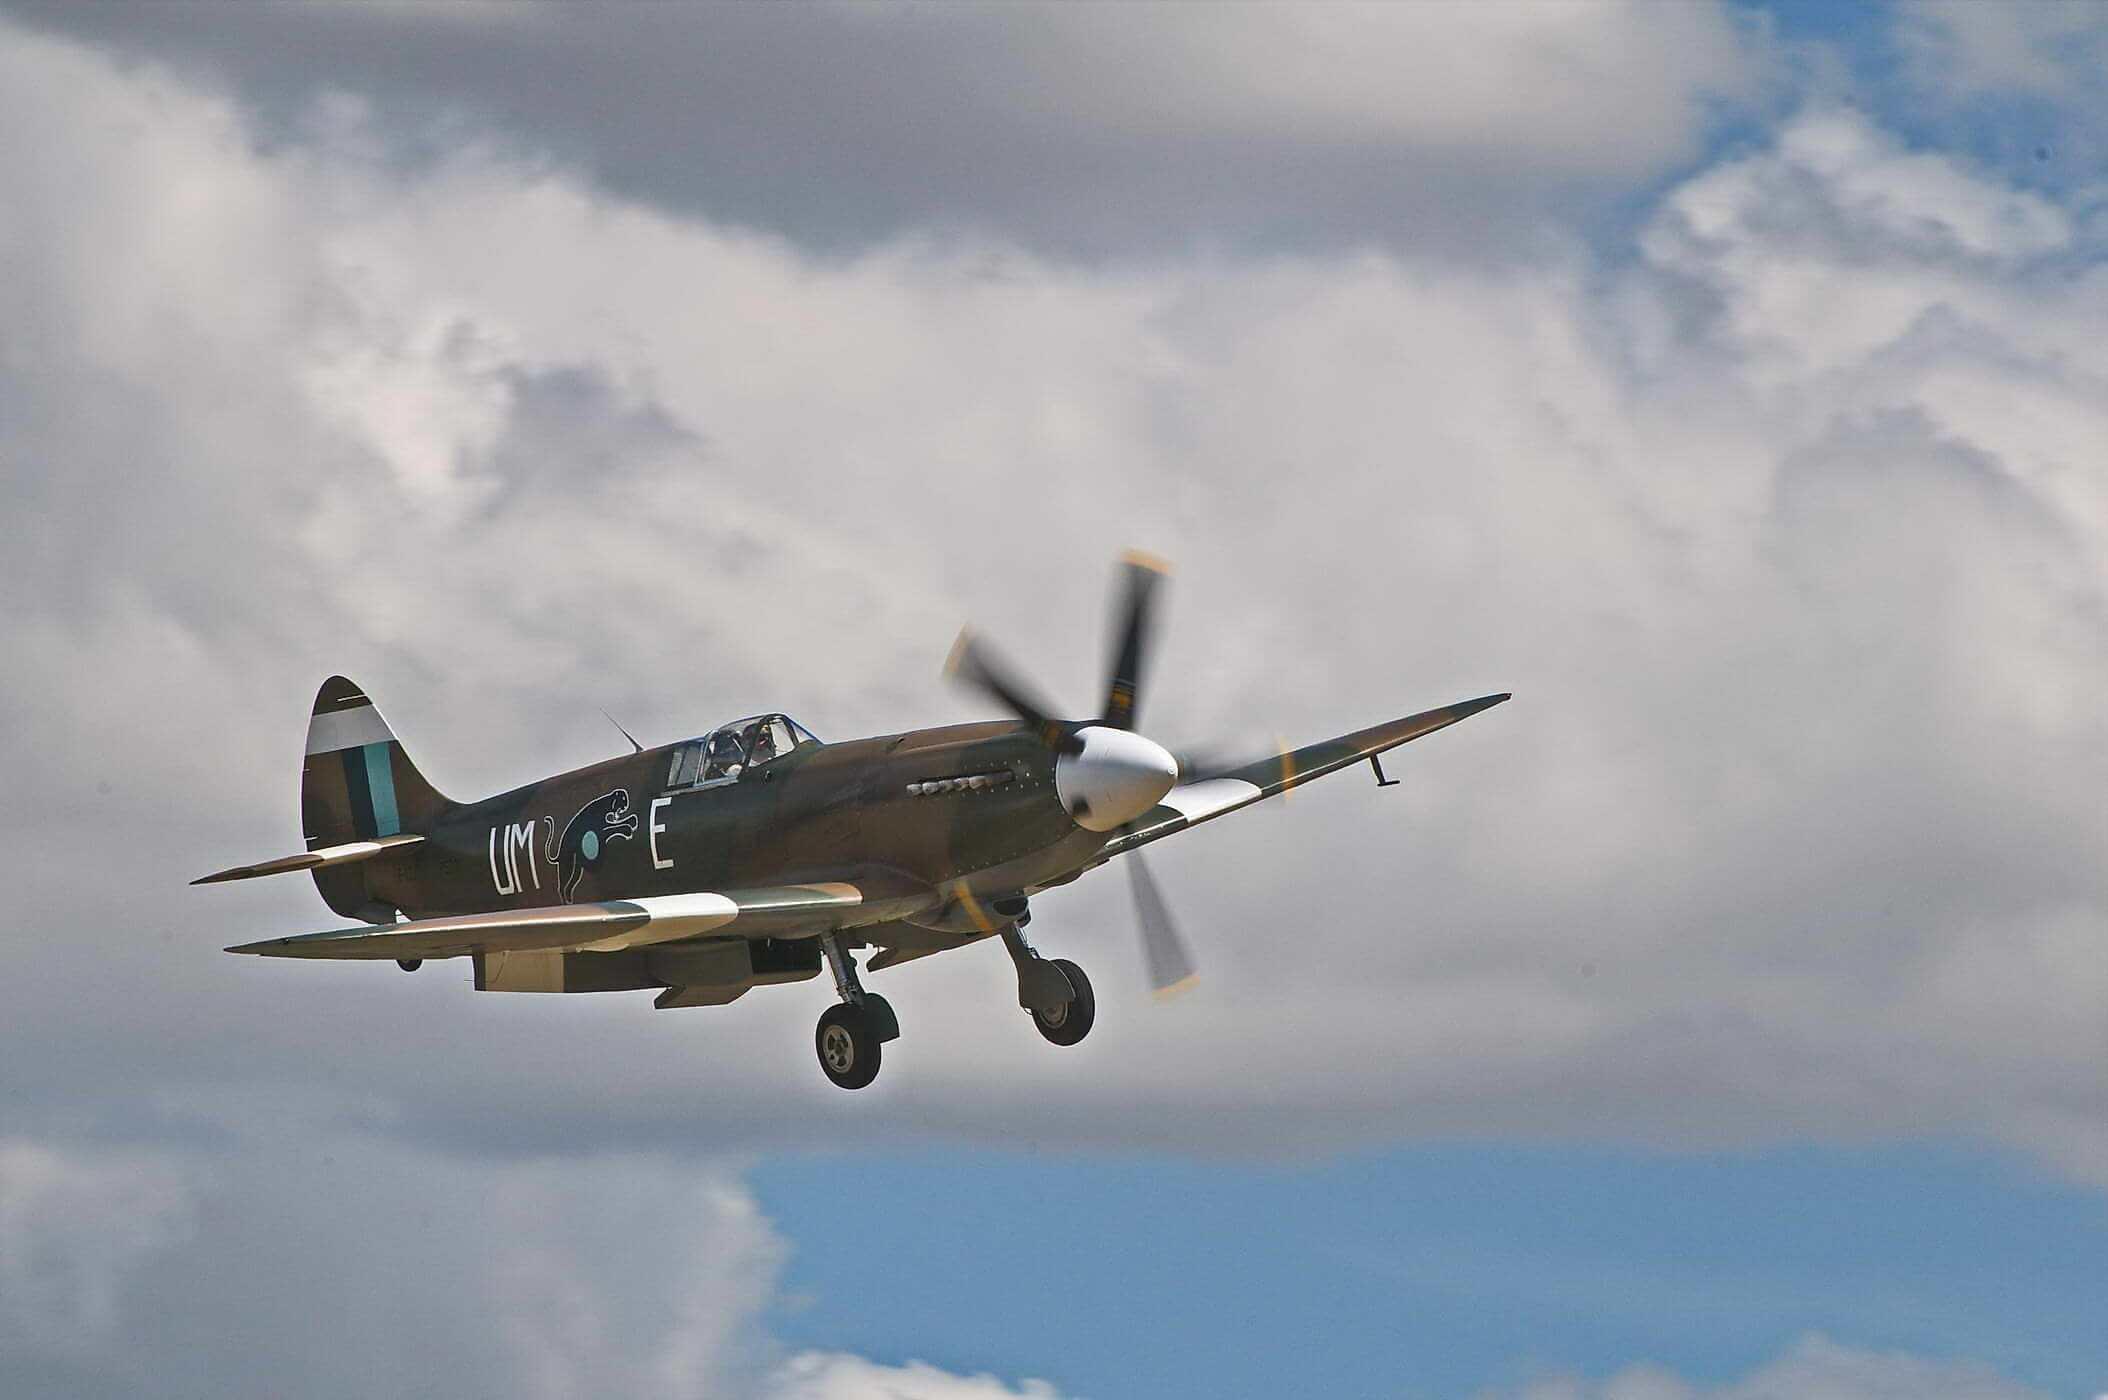 Supermarine Spitfire PR XIX PS890